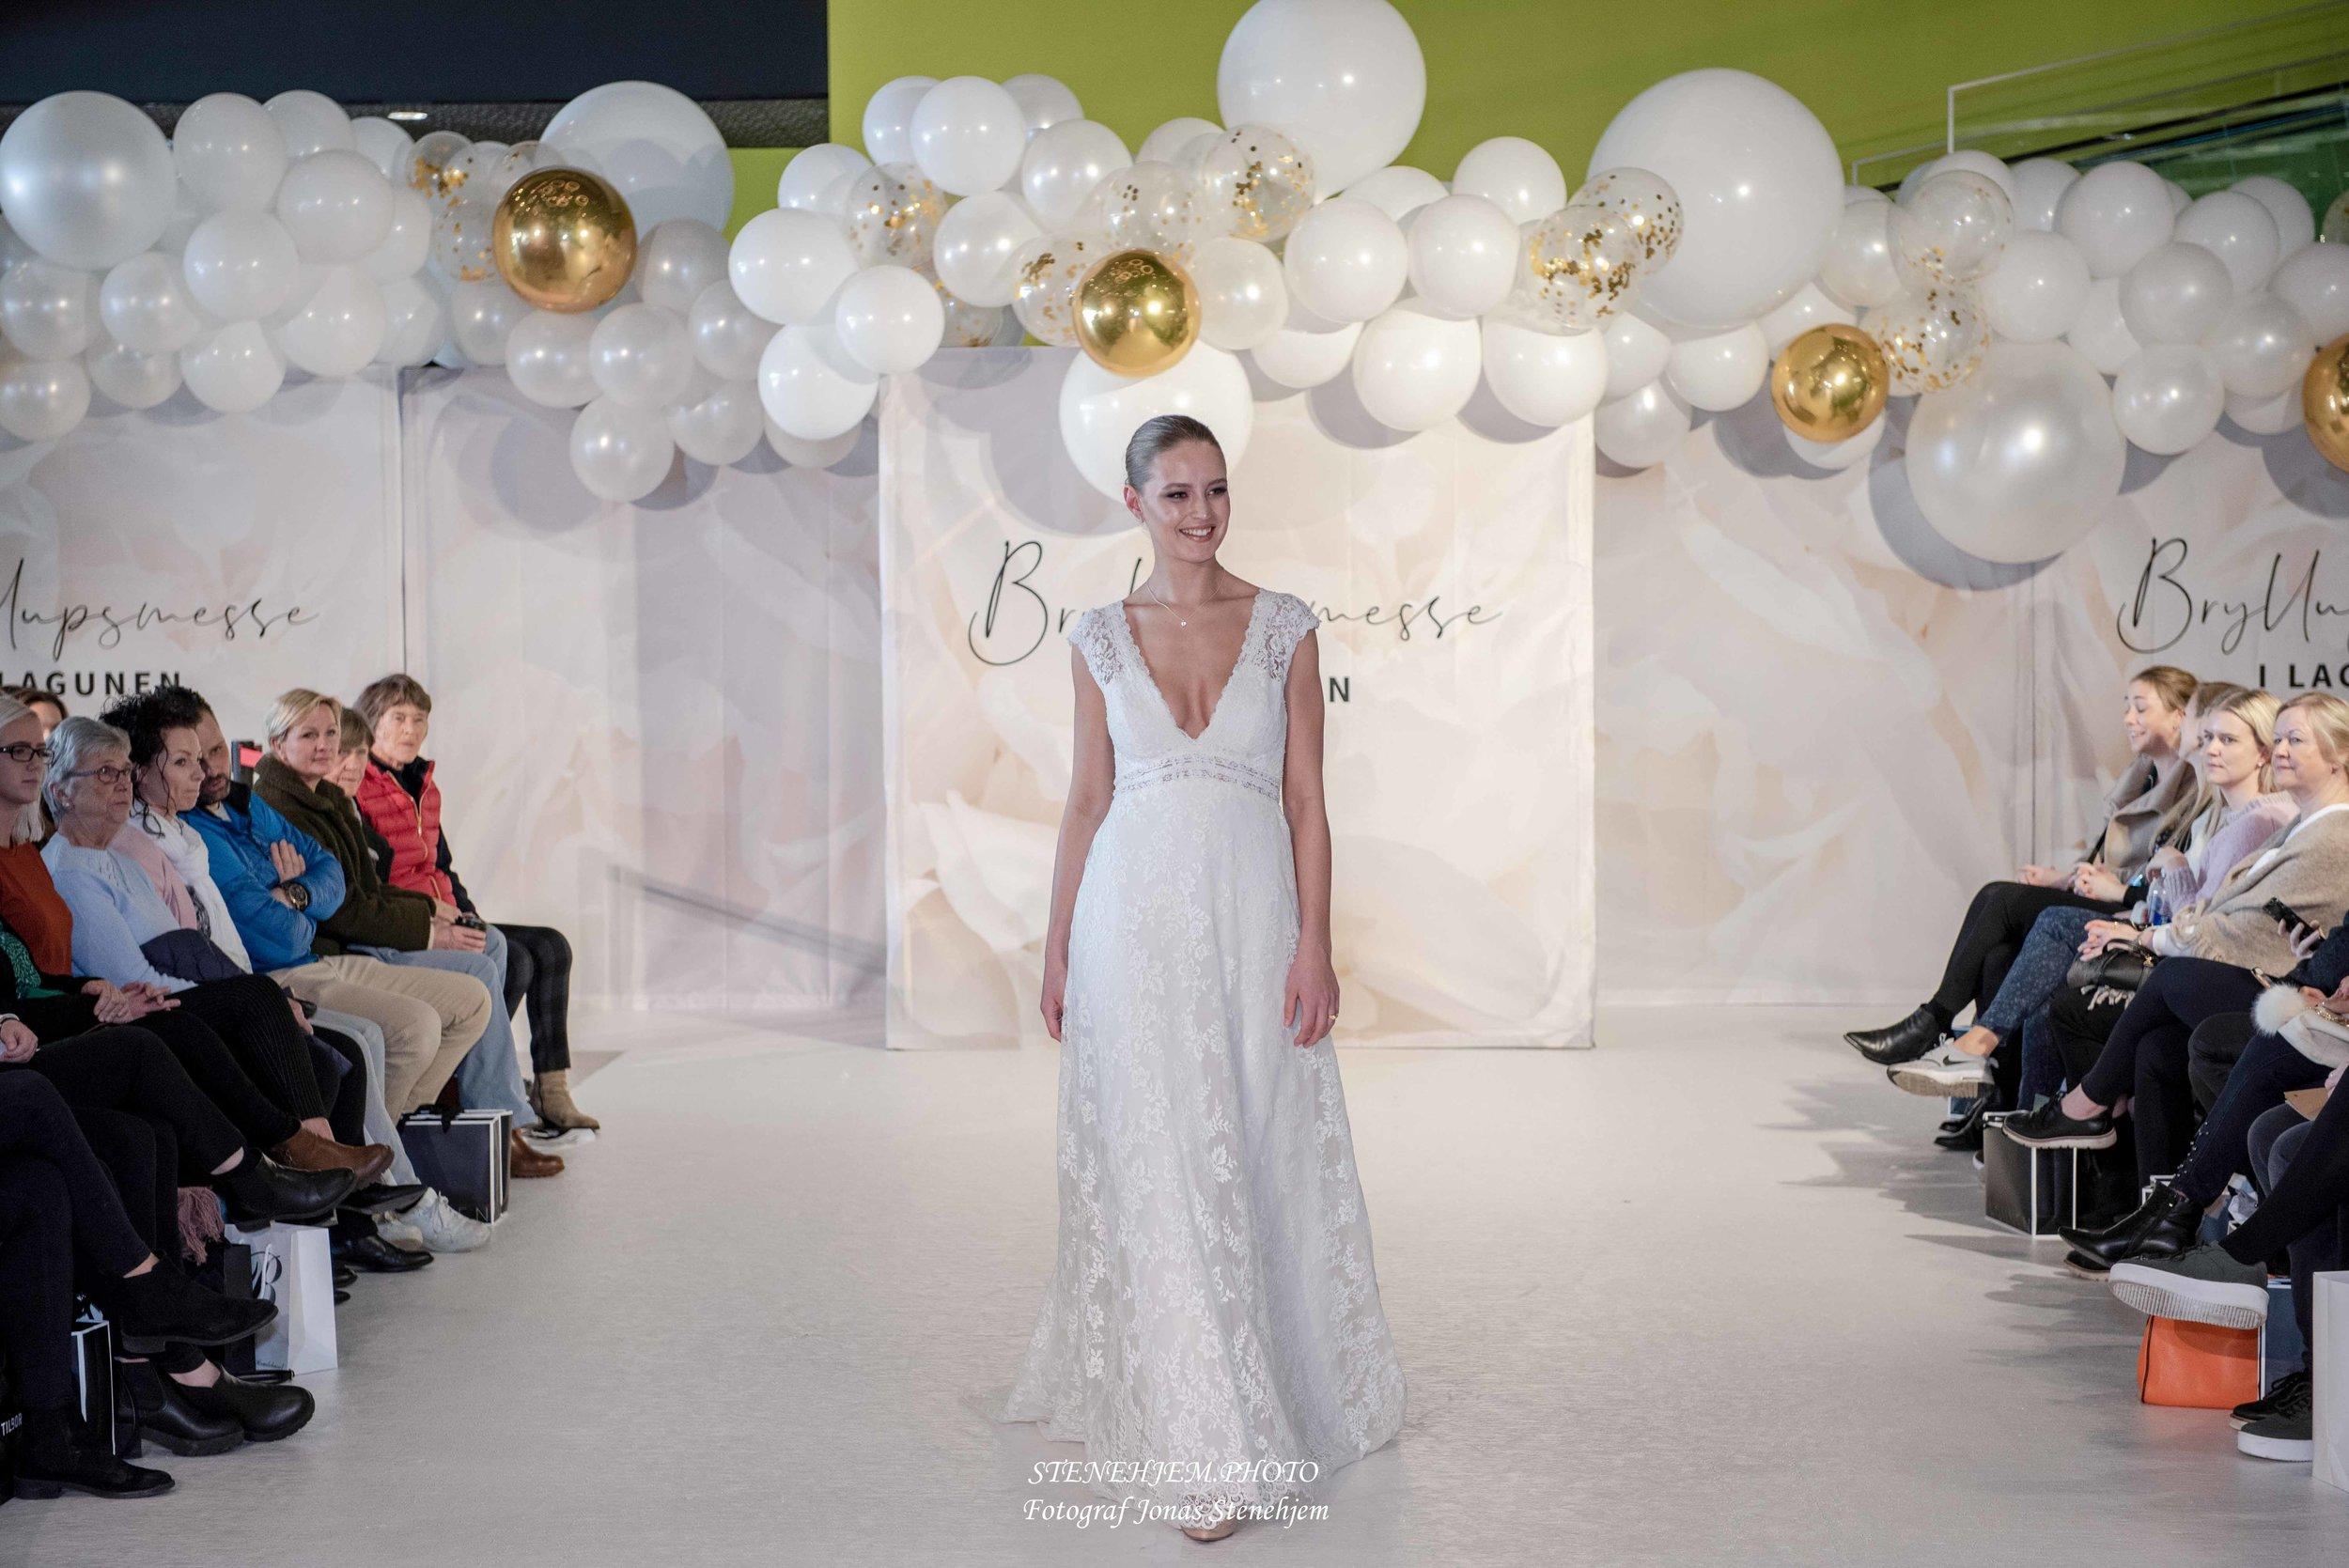 Bryllupsmesse_Lagunen_mittaltweddingfair__070.jpg